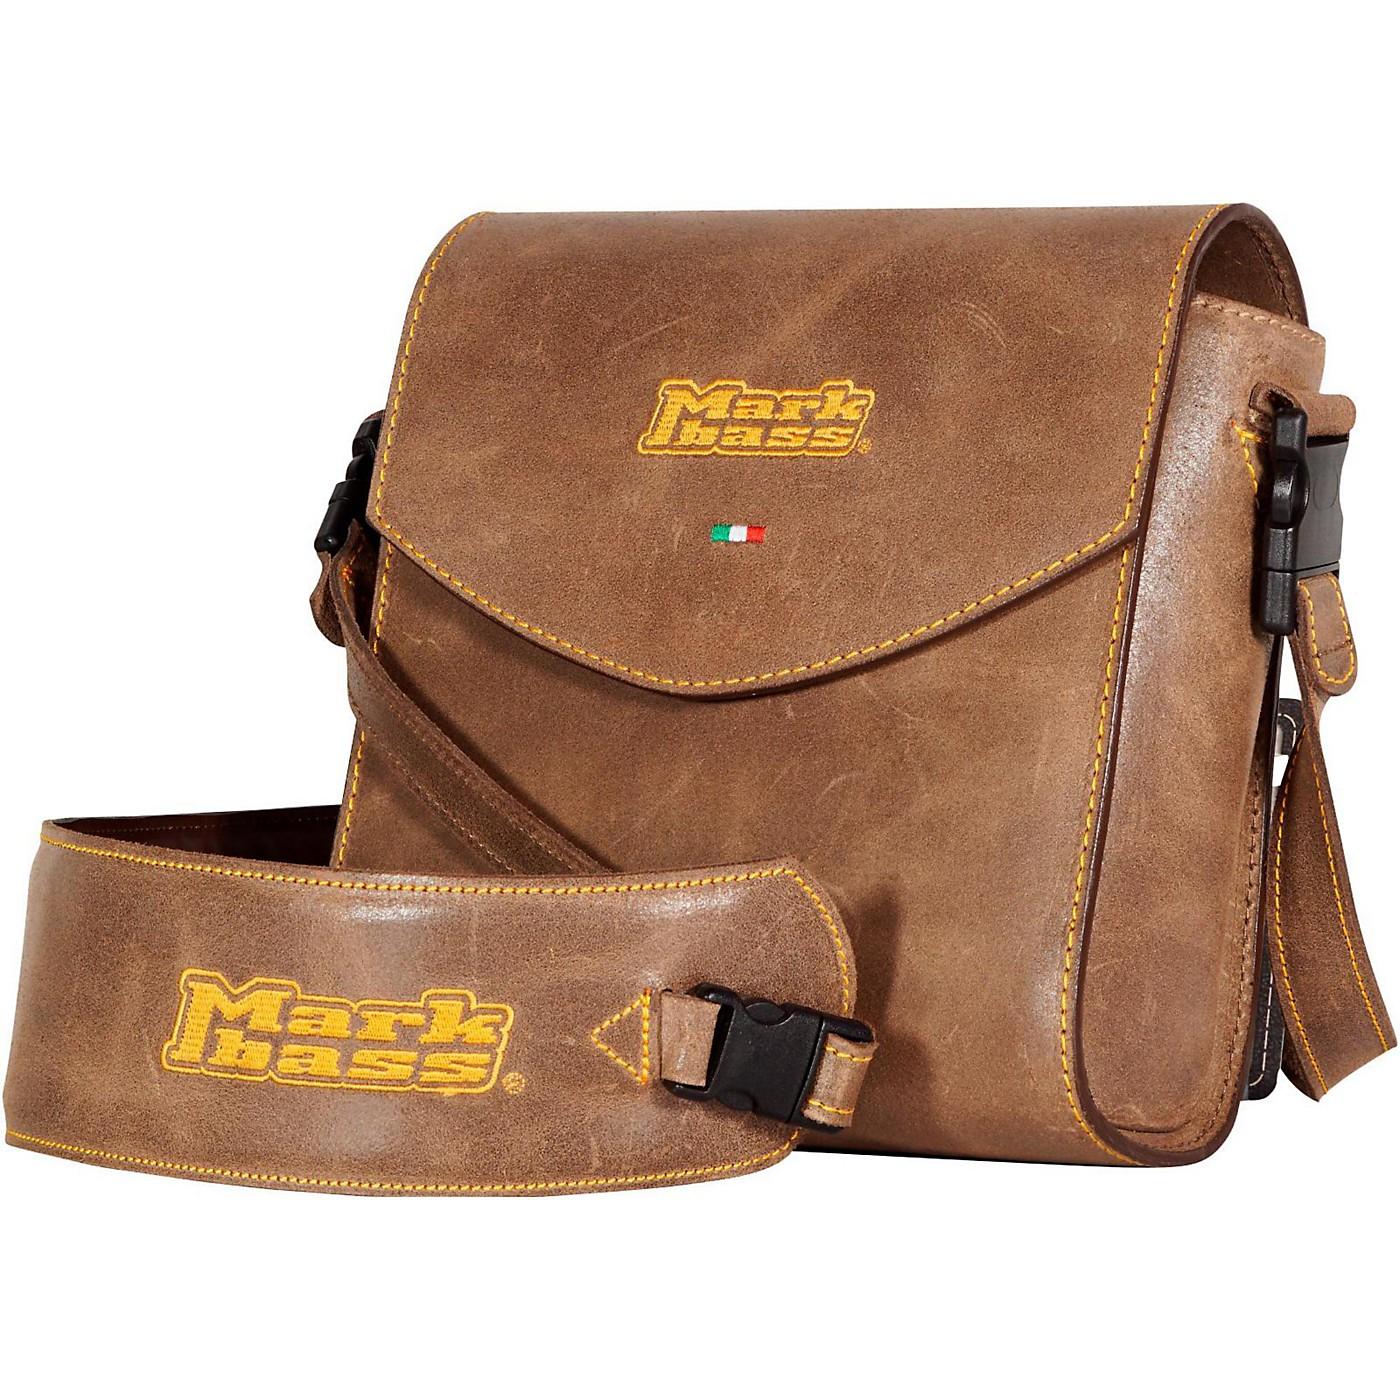 Markbass Nano Mark 300 Leather Bag thumbnail